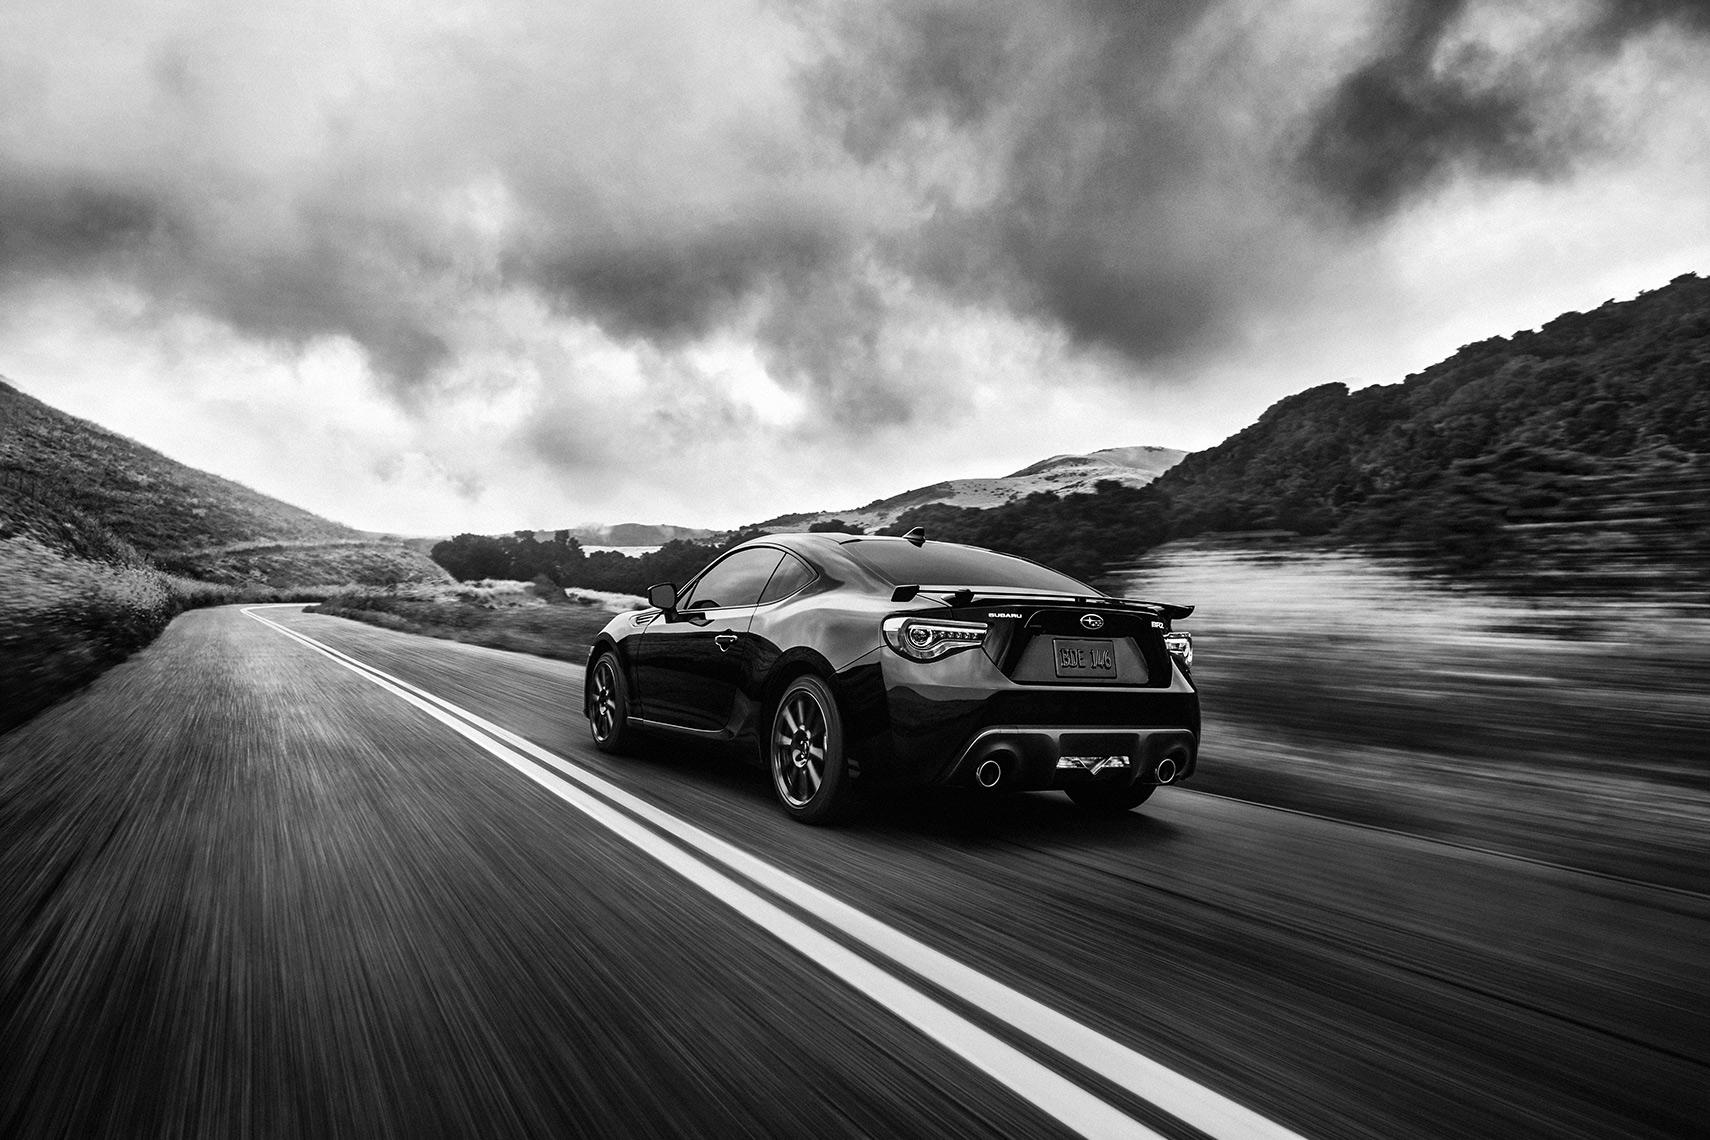 Tyler_Gourley_Photography_Automotive_240.jpg